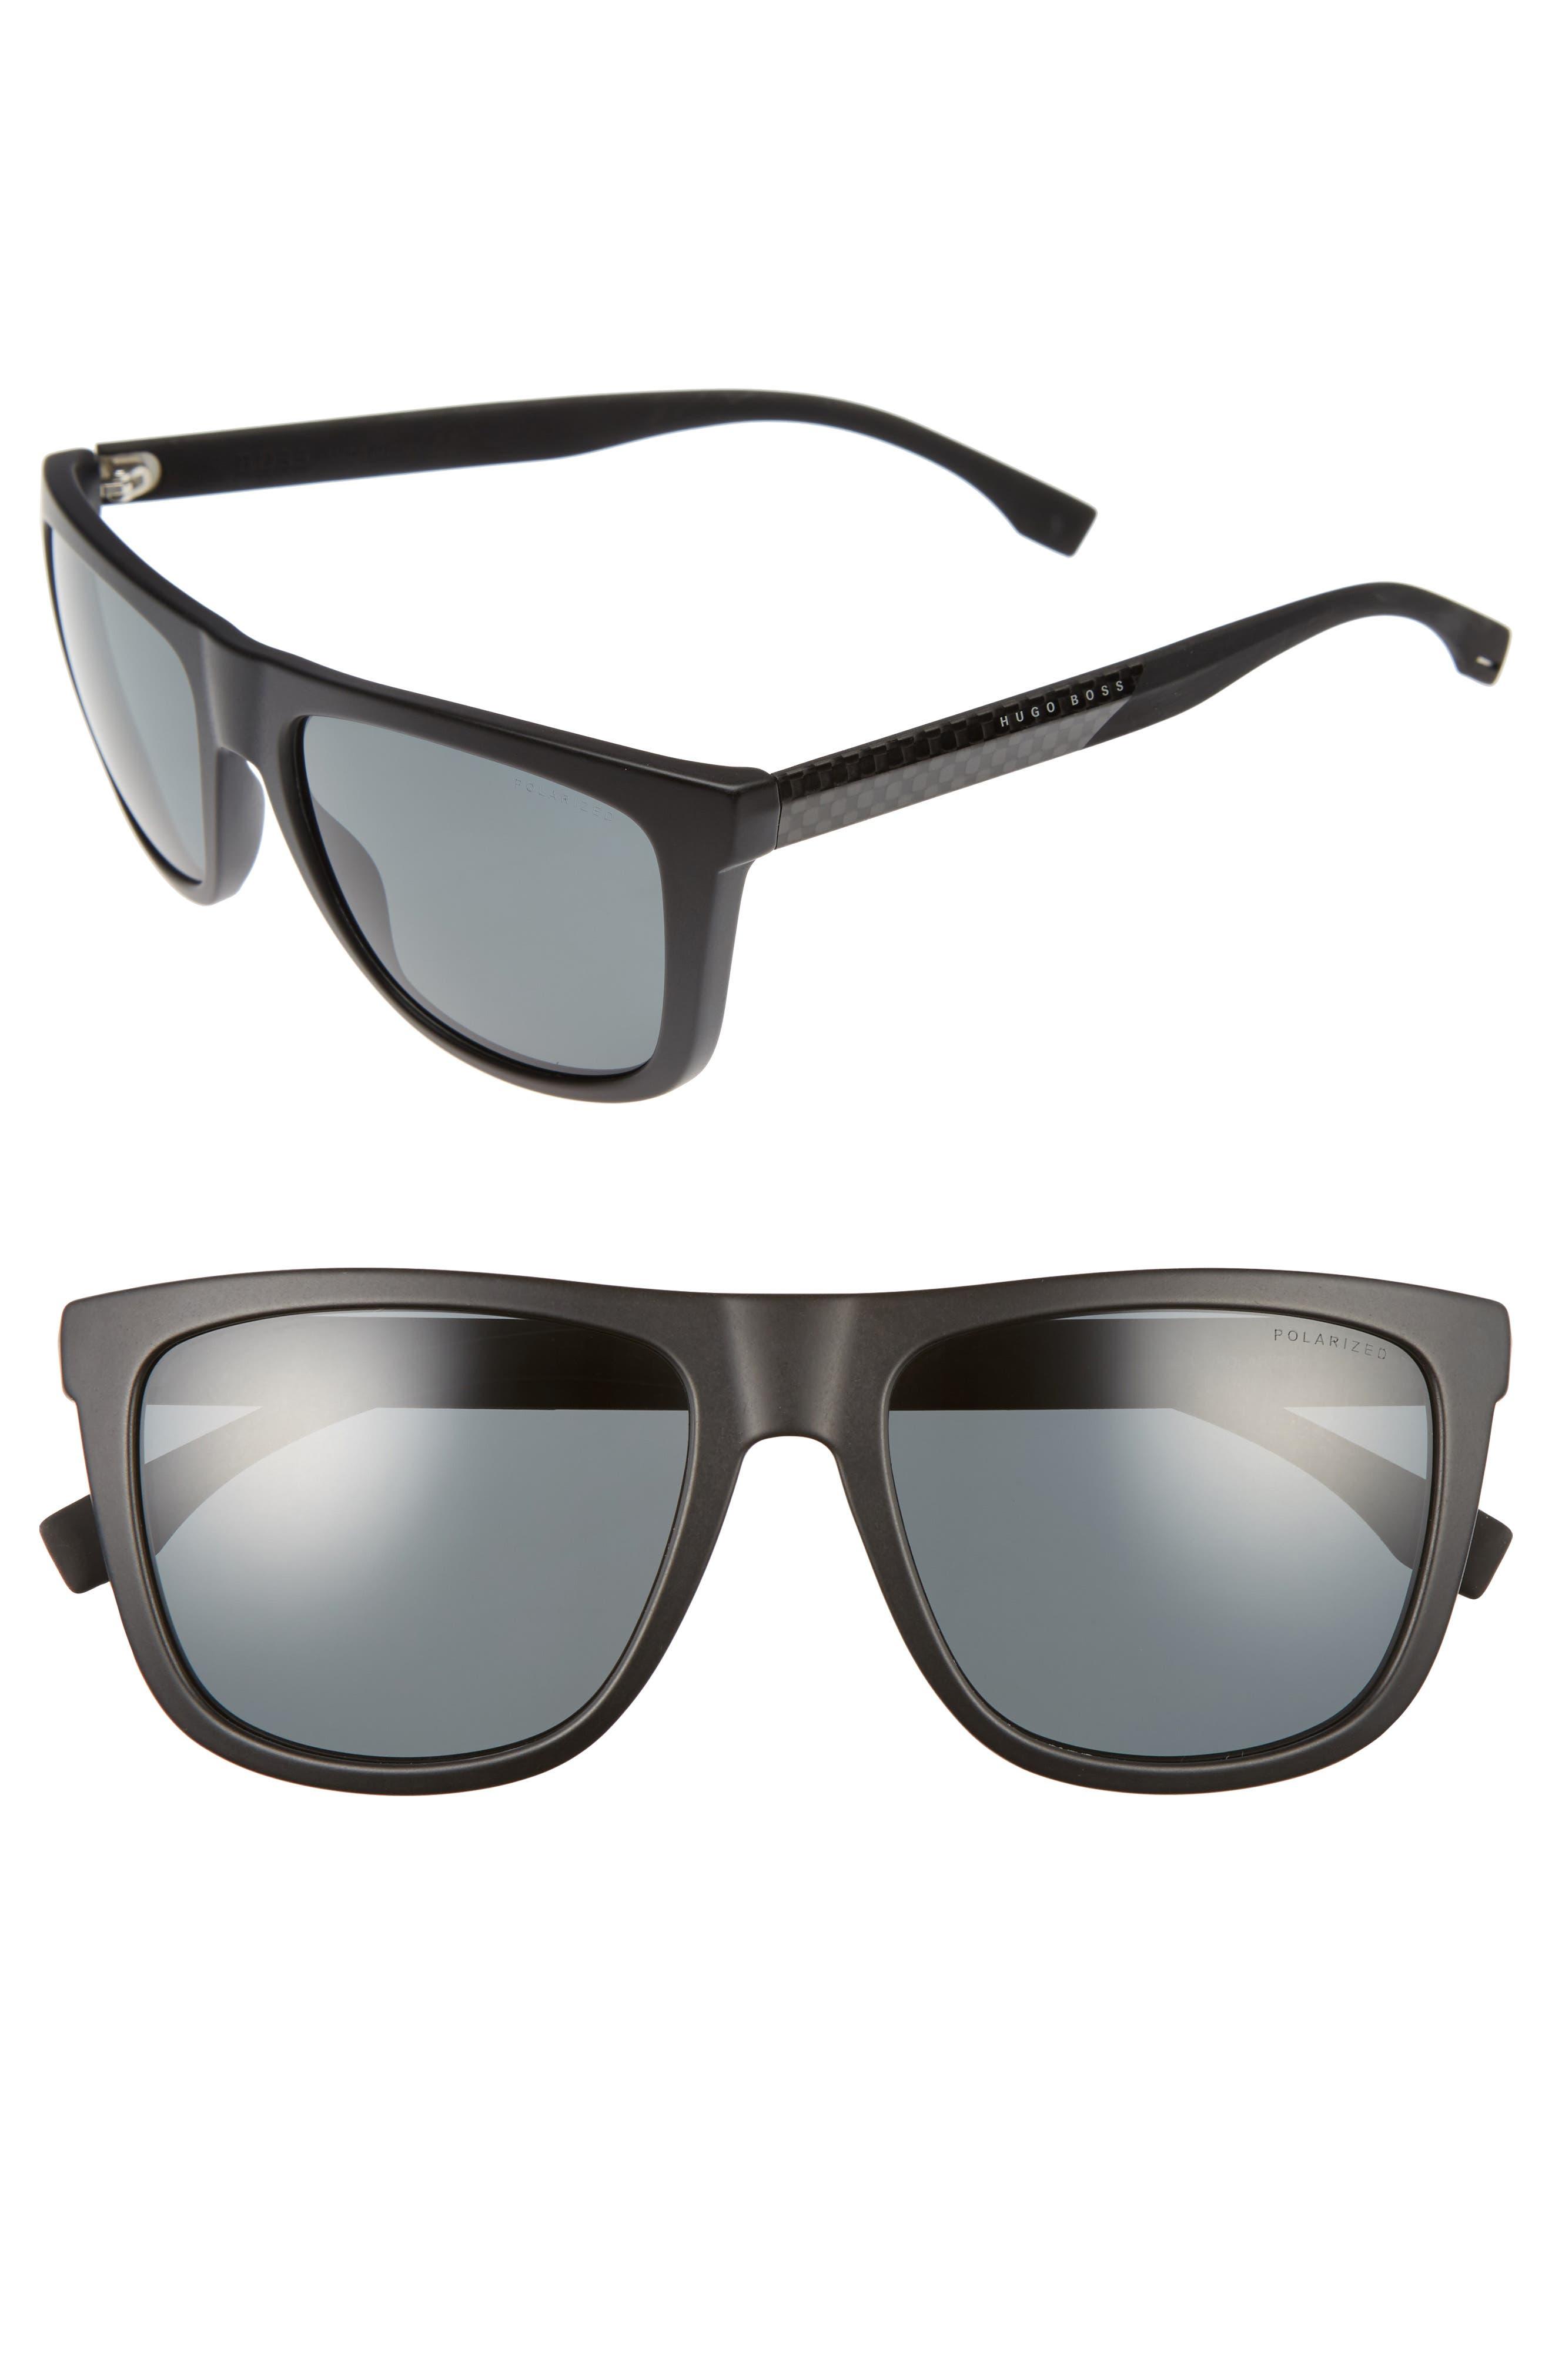 56mm Polarized Sunglasses,                             Alternate thumbnail 2, color,                             001